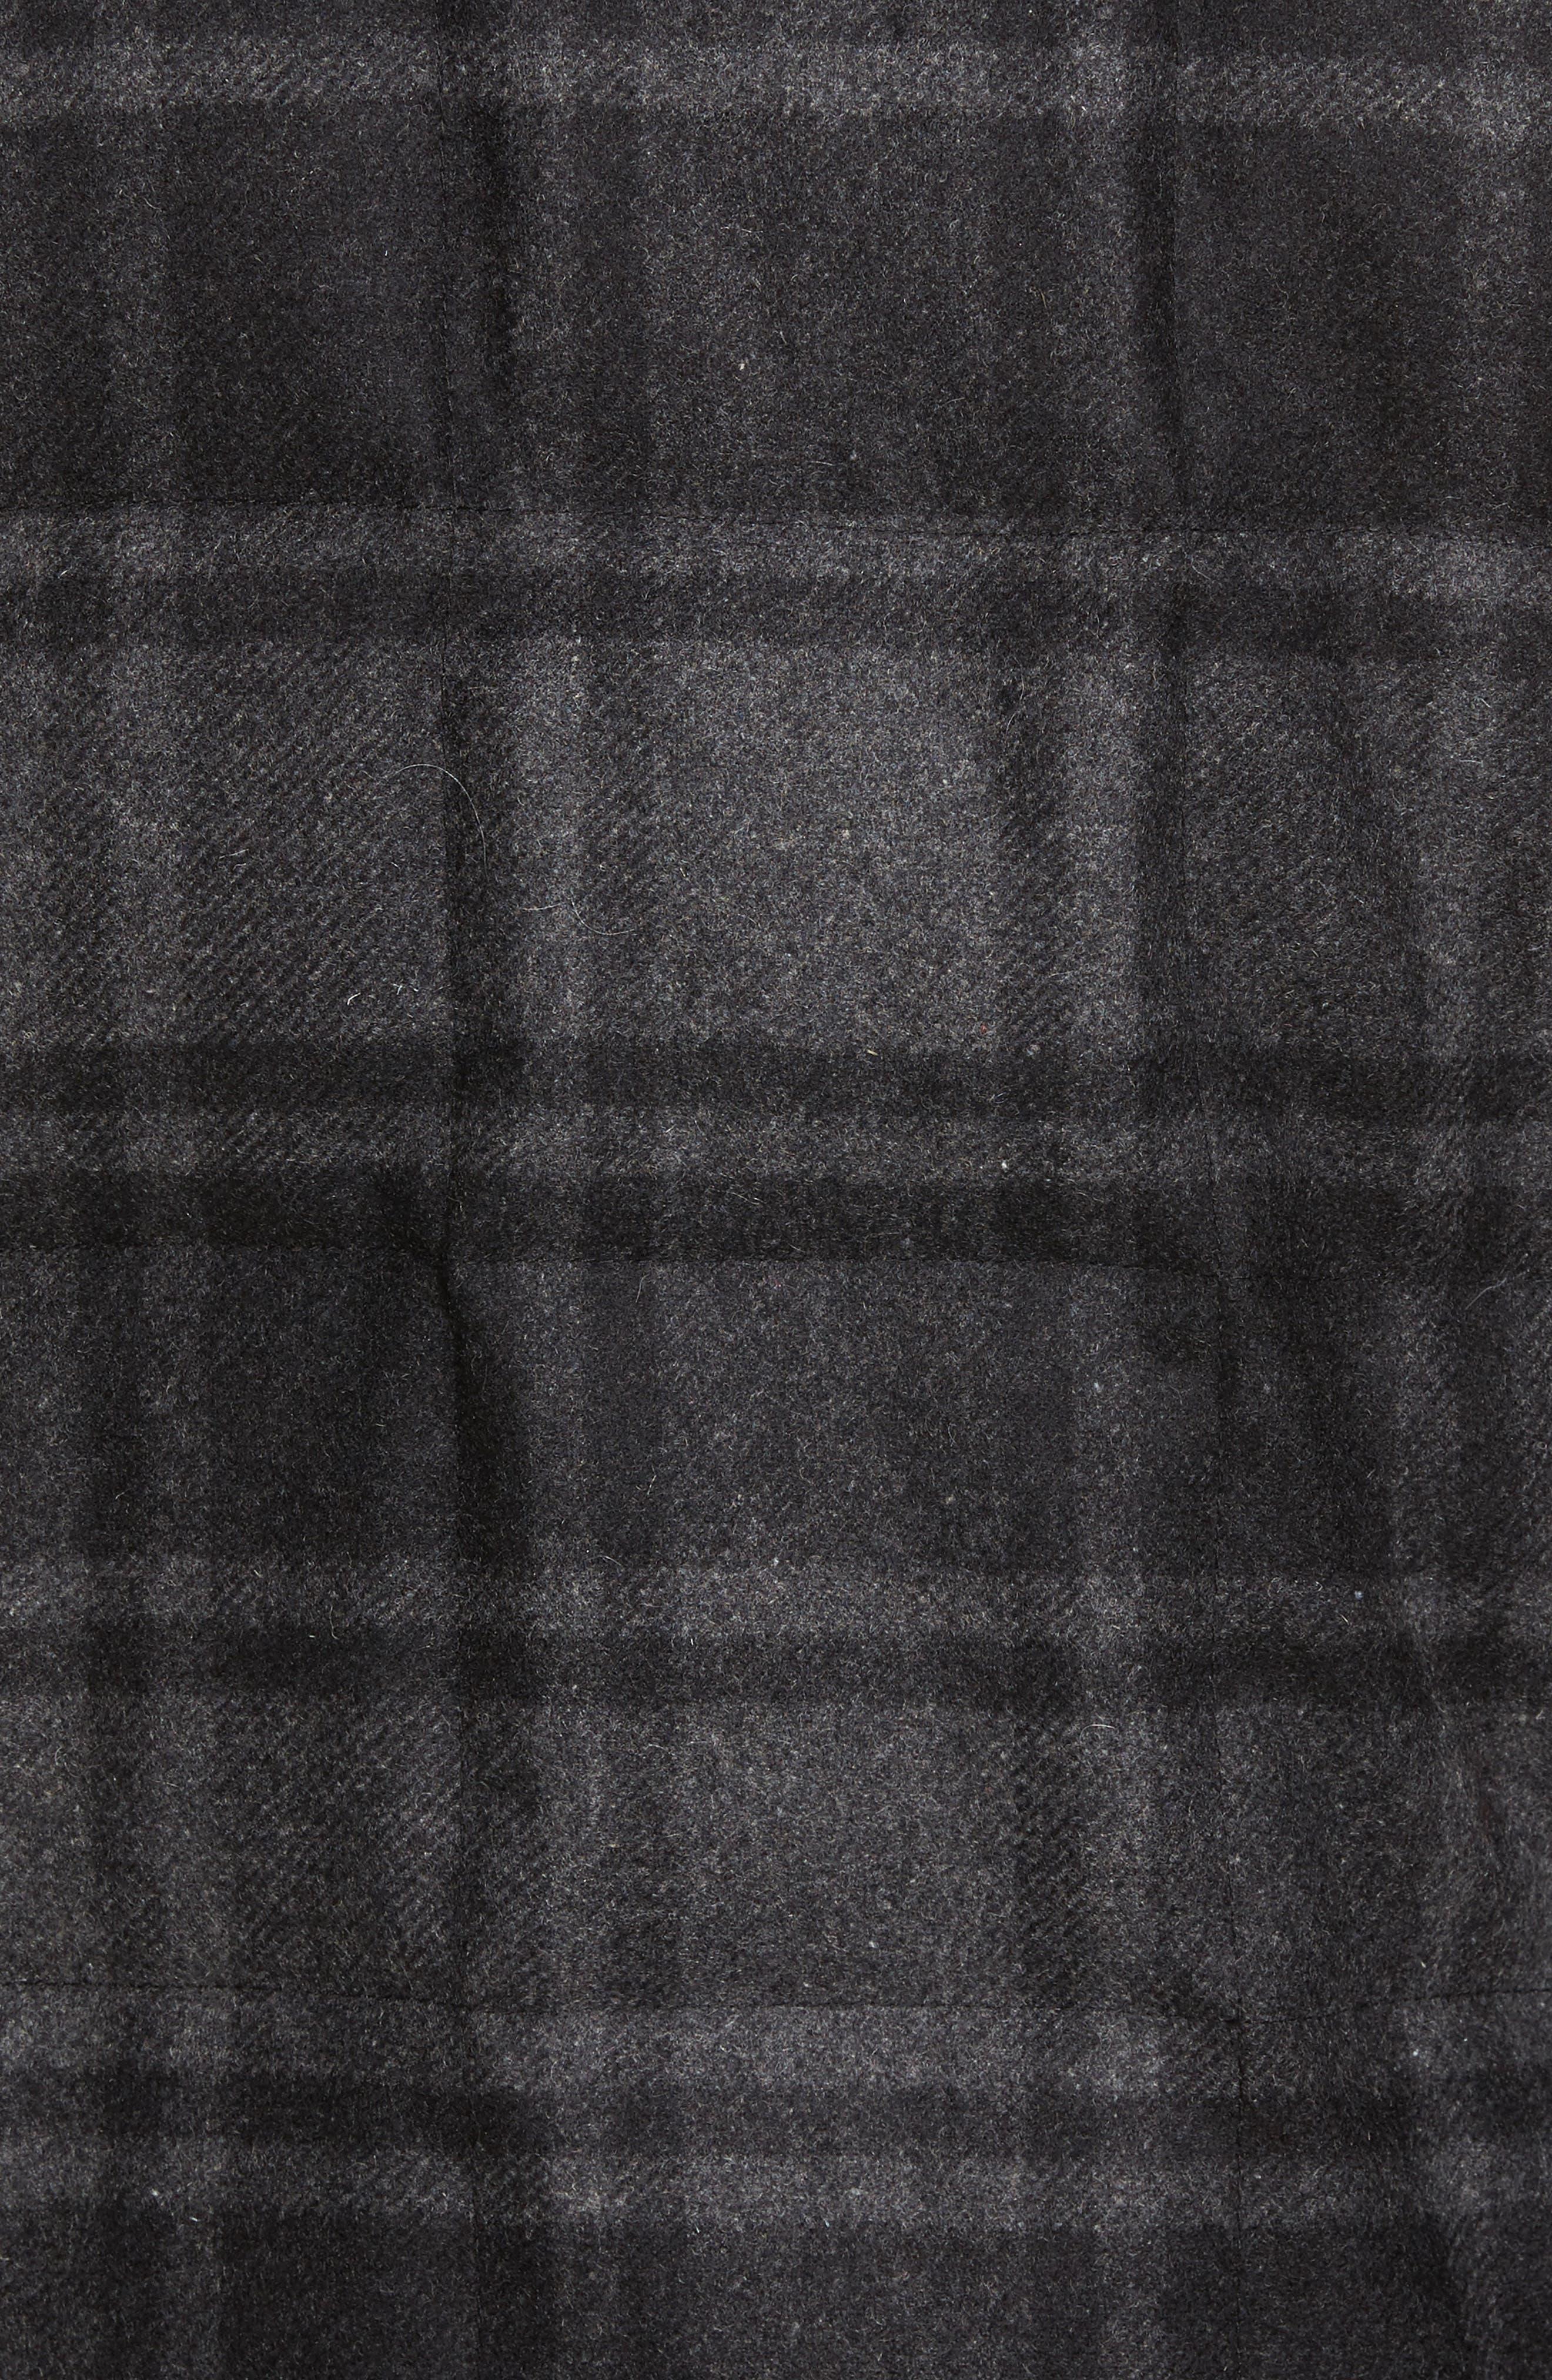 Yosemite Jacket,                             Alternate thumbnail 4, color,                             Black/ Charcoal Plaid